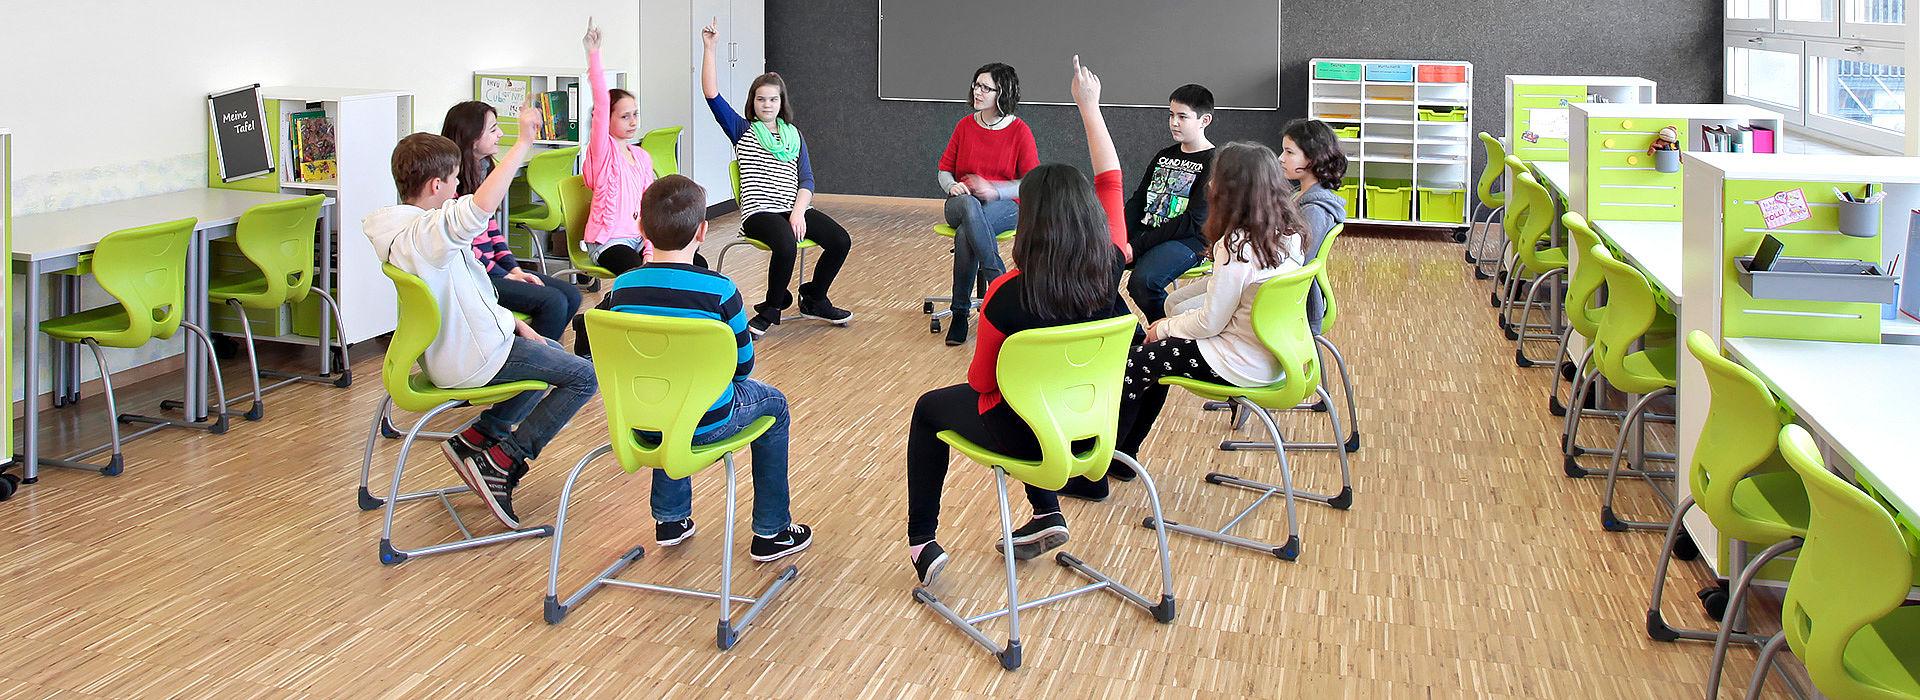 salle de classe flexible - ronde